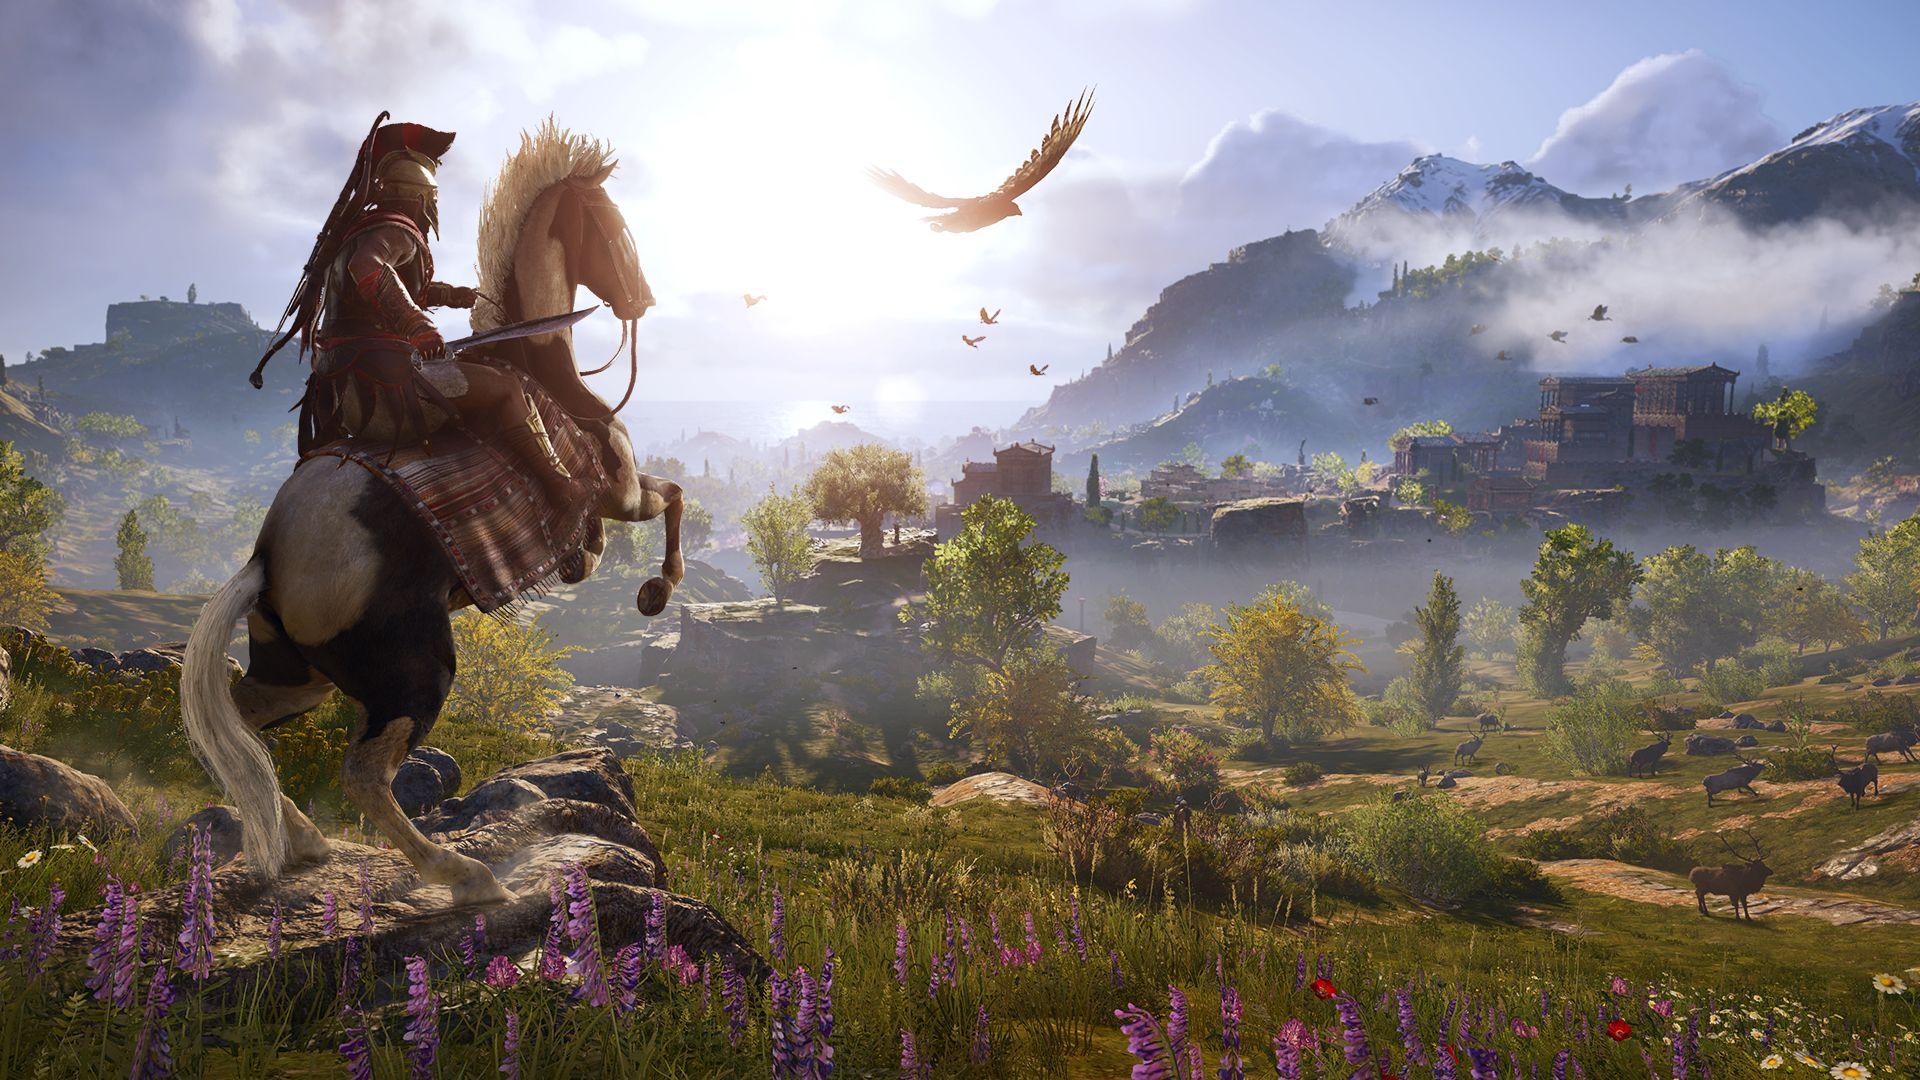 Mode Eksplorasi Assassins Creed Odyssey, Petualangan Lebih Seru